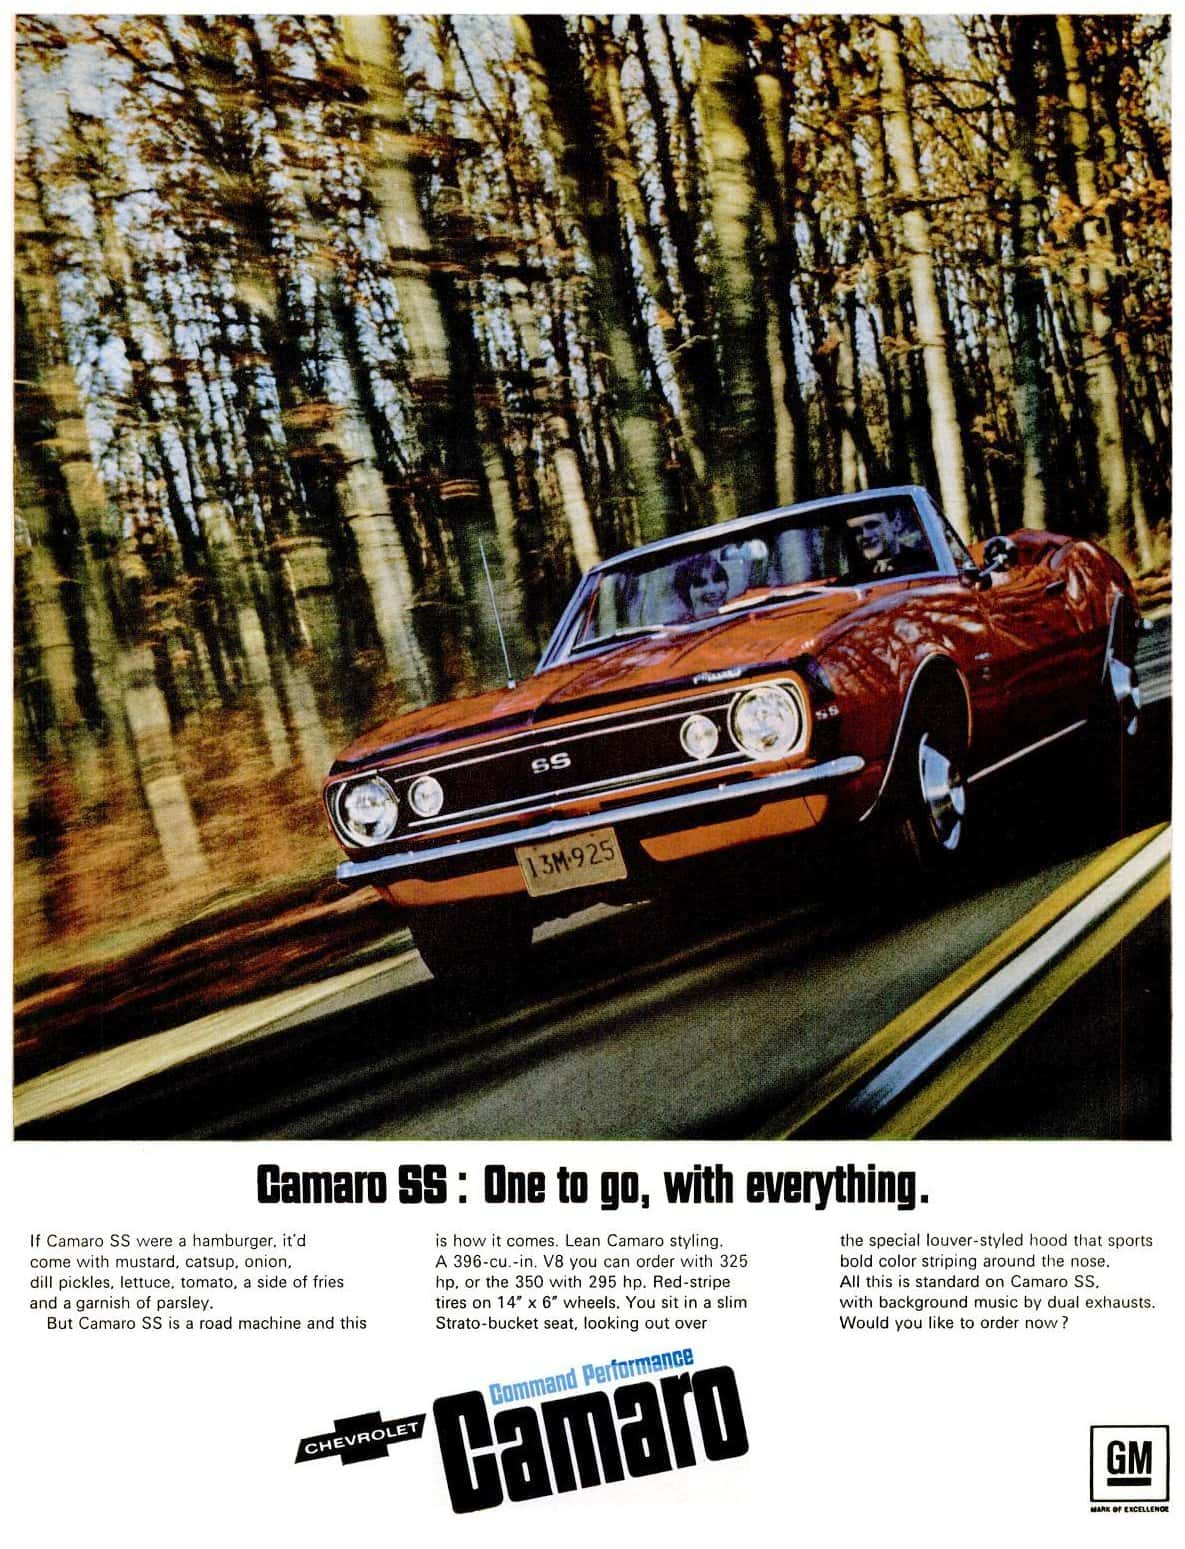 Mar 31, 1967 Chevrolet Camaro cars